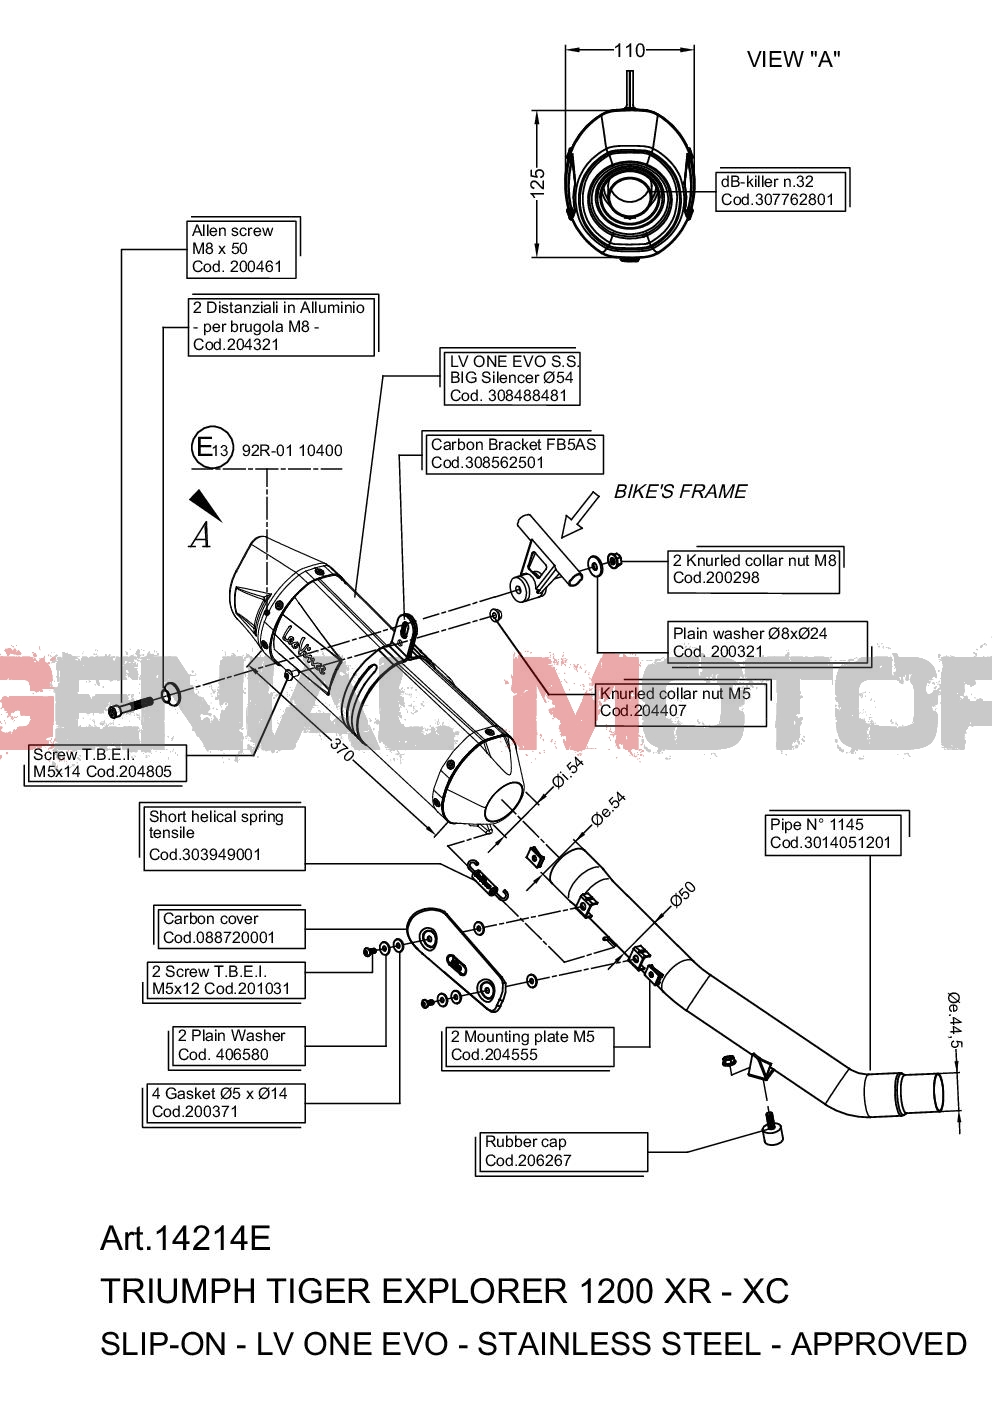 PIAGGIO APE CAR//APE 601  LEOVINCE KOMPLETT AUSPUFFANLAGE SITO STAHL 0226